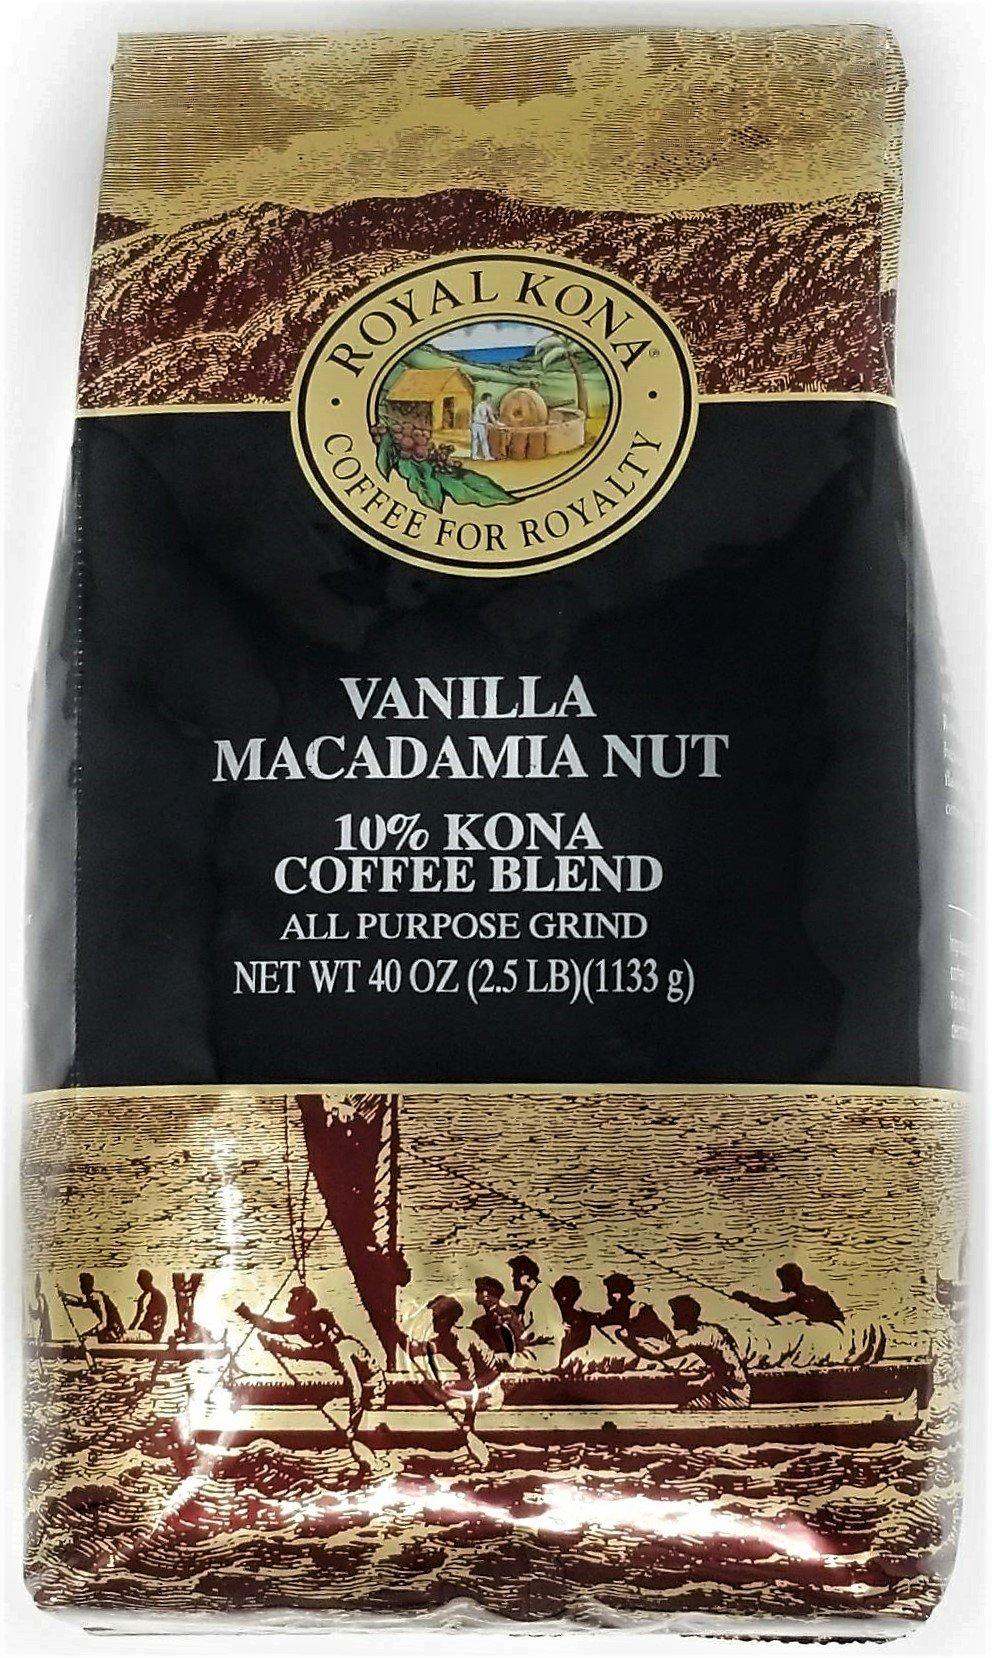 Royal Kona Coffee, Vanilla Macadamia Nut, Ground, 10% Kona Coffee Blend (40 Oz./2.5 Pound Bag) Roasted to Perfection in Hawaii